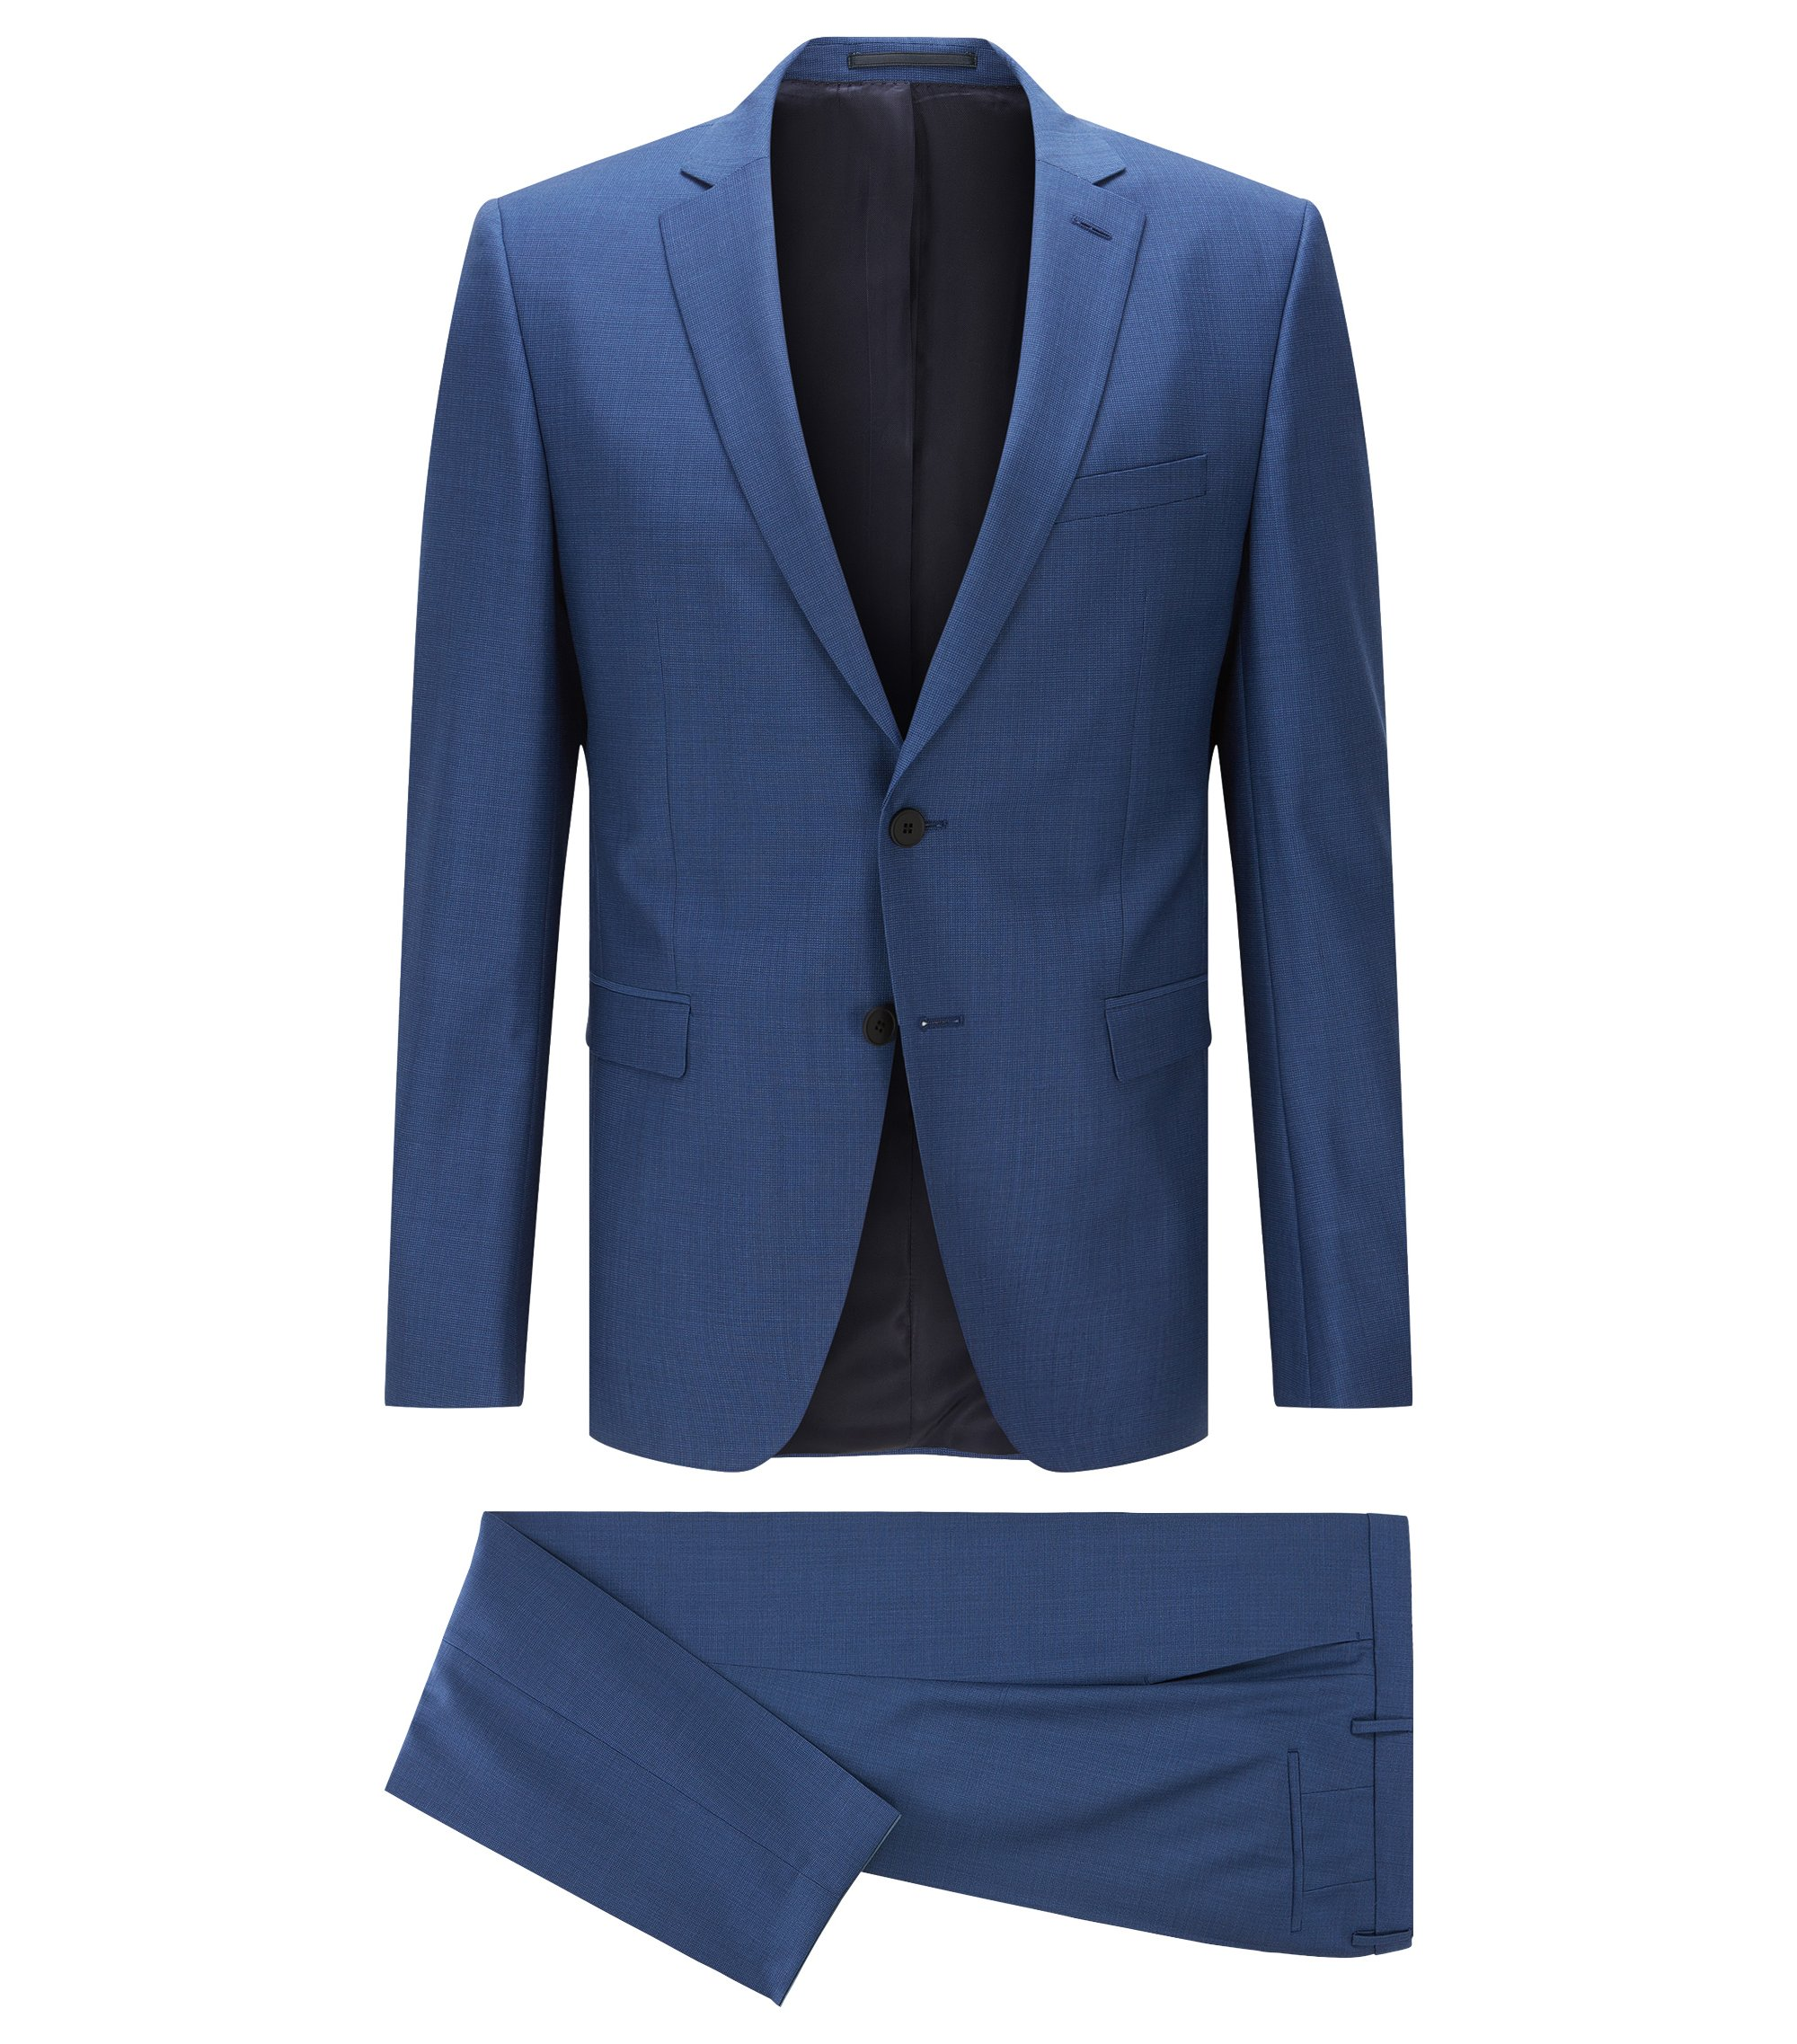 Super 100 Wool Suit, Extra Slim Fit | Reymond/Wenton, Blue